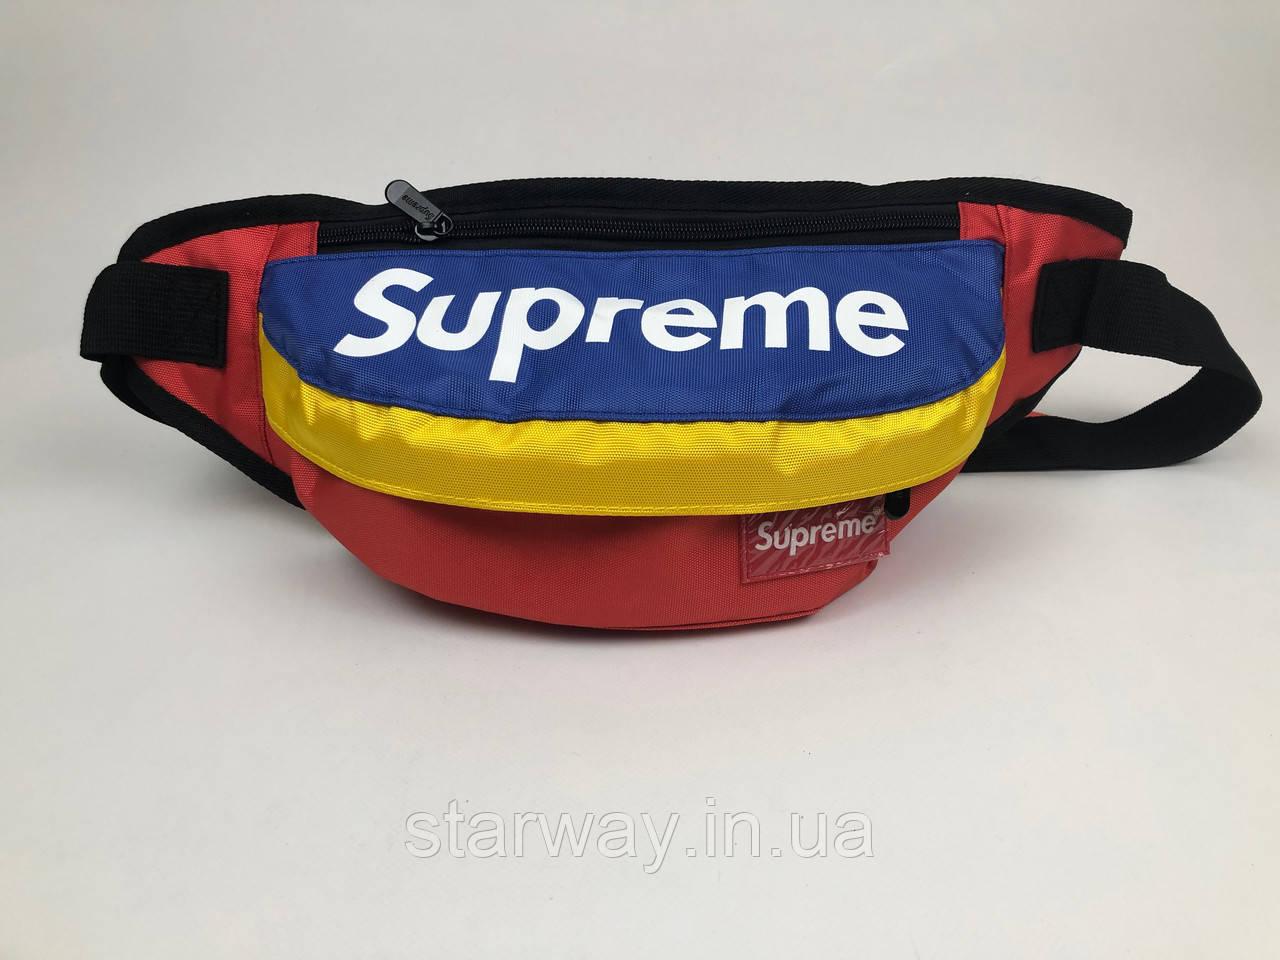 Бананка Supreme logo | Сумка синие-красно-желтая | бирка